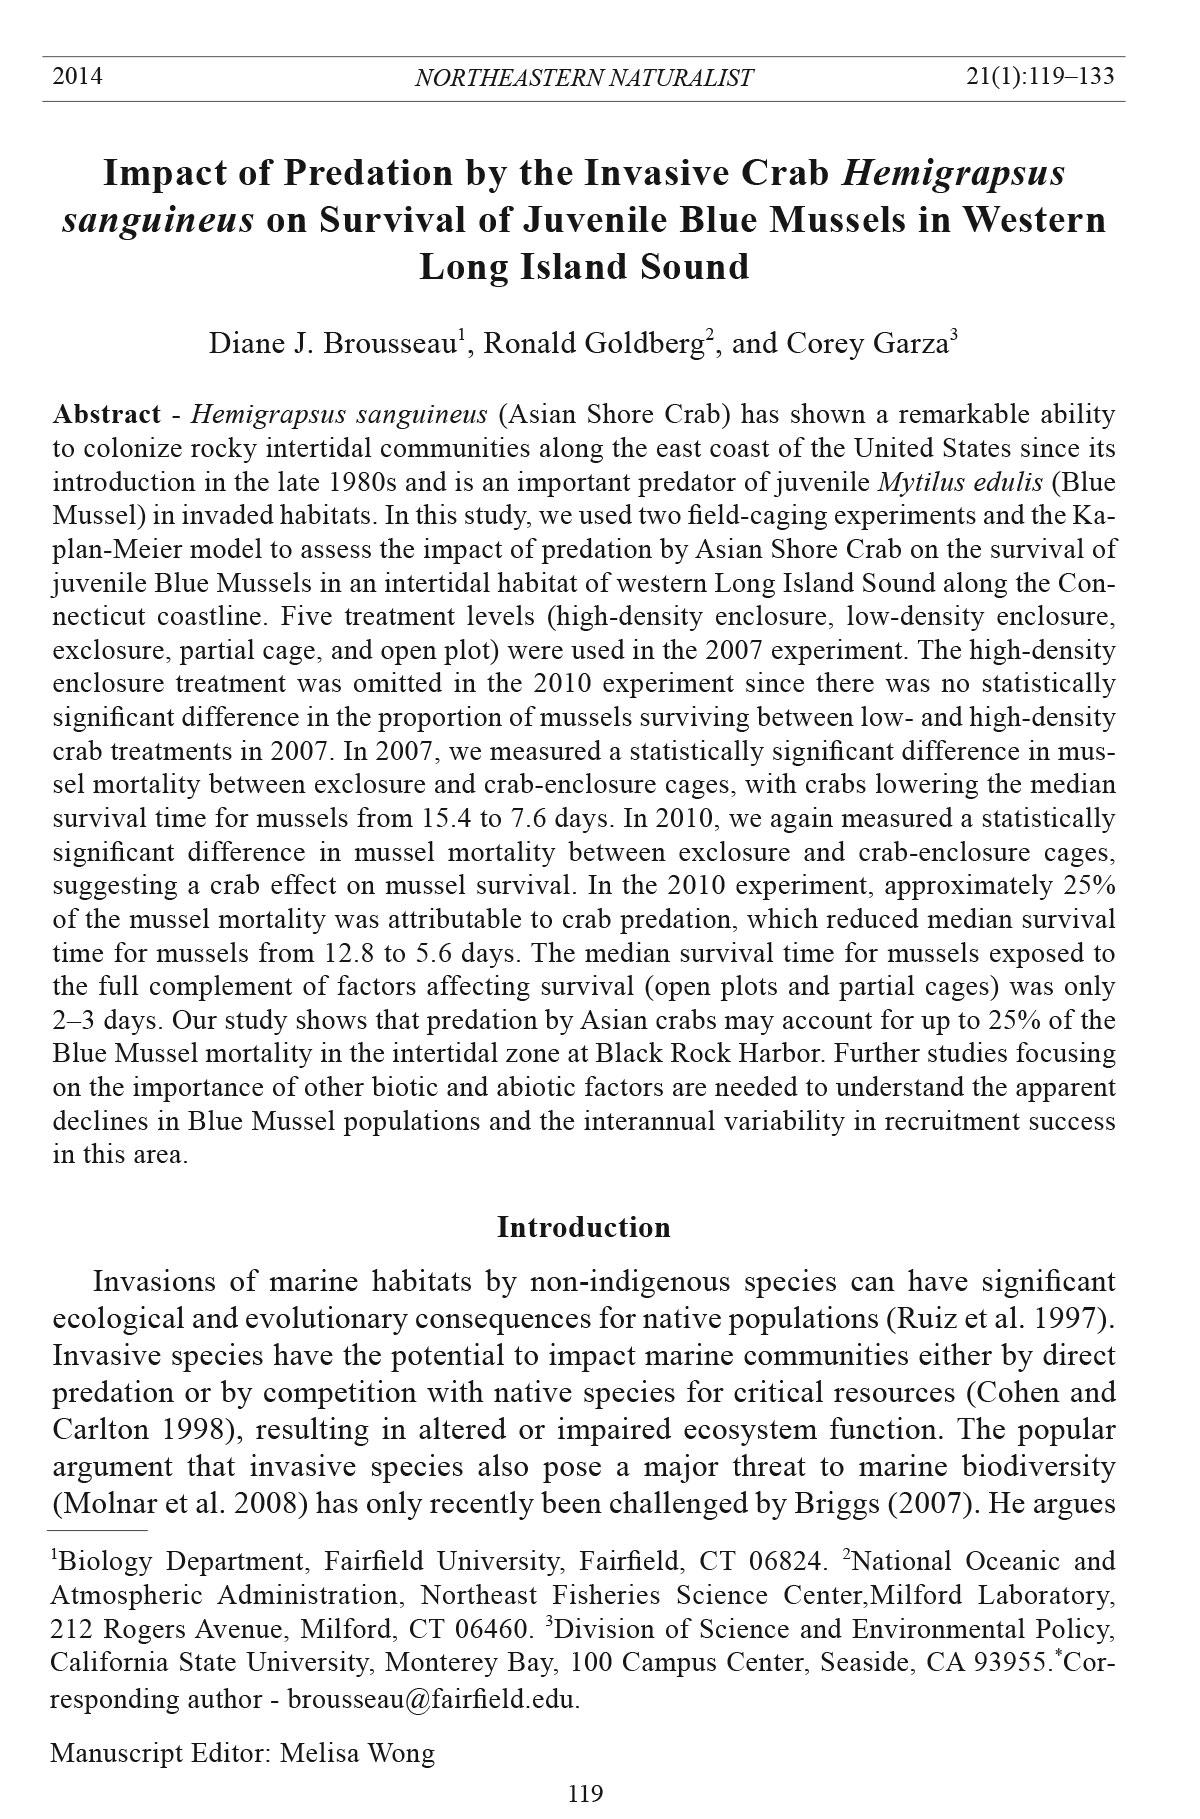 Northeastern Naturalist Volume 21 Number 1 2014 119133